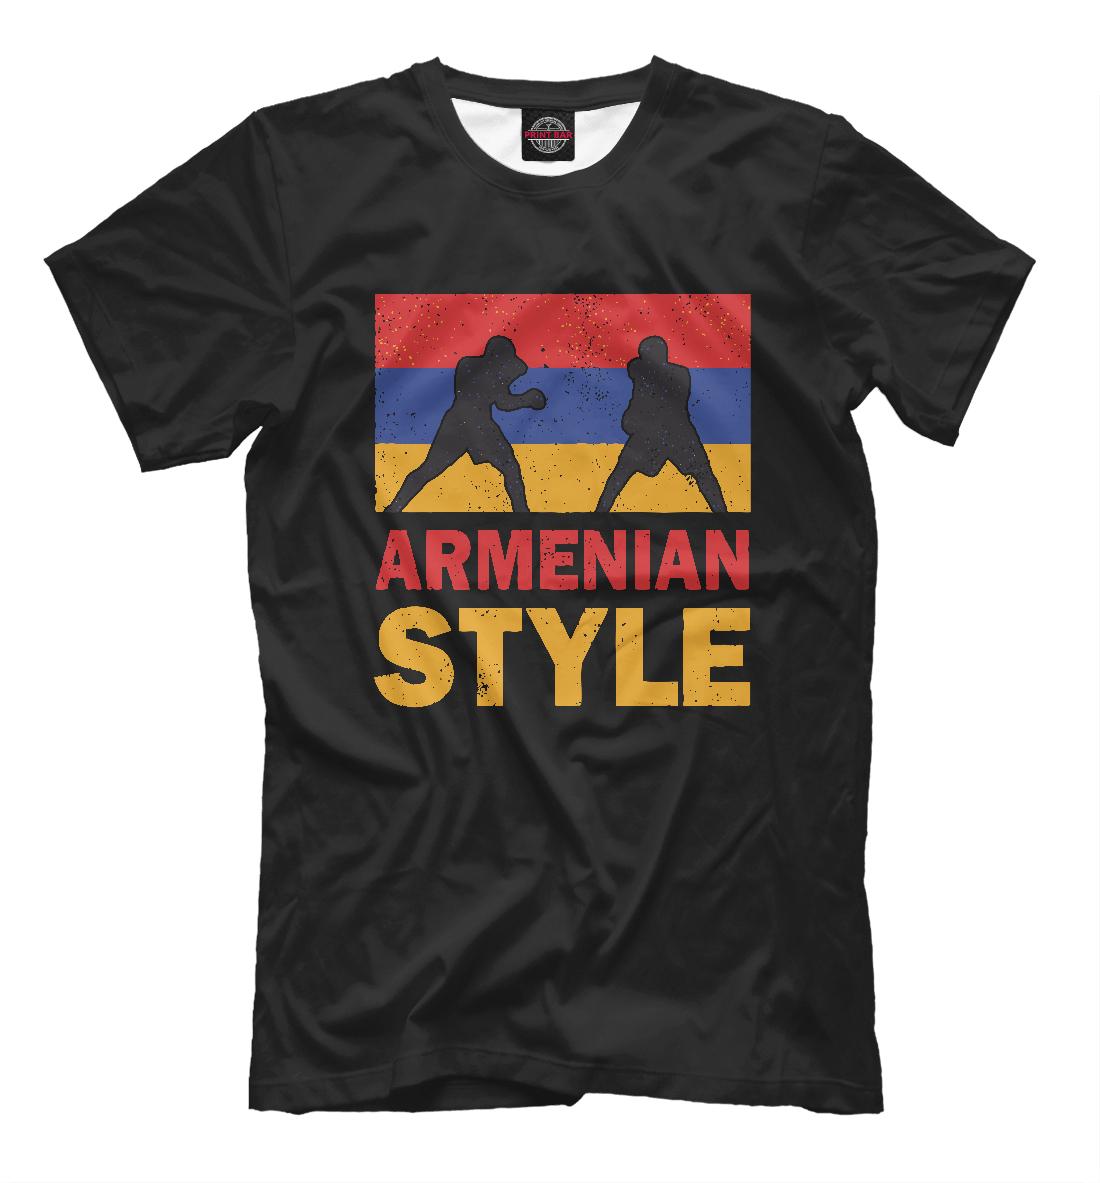 Футболка Армянский стиль